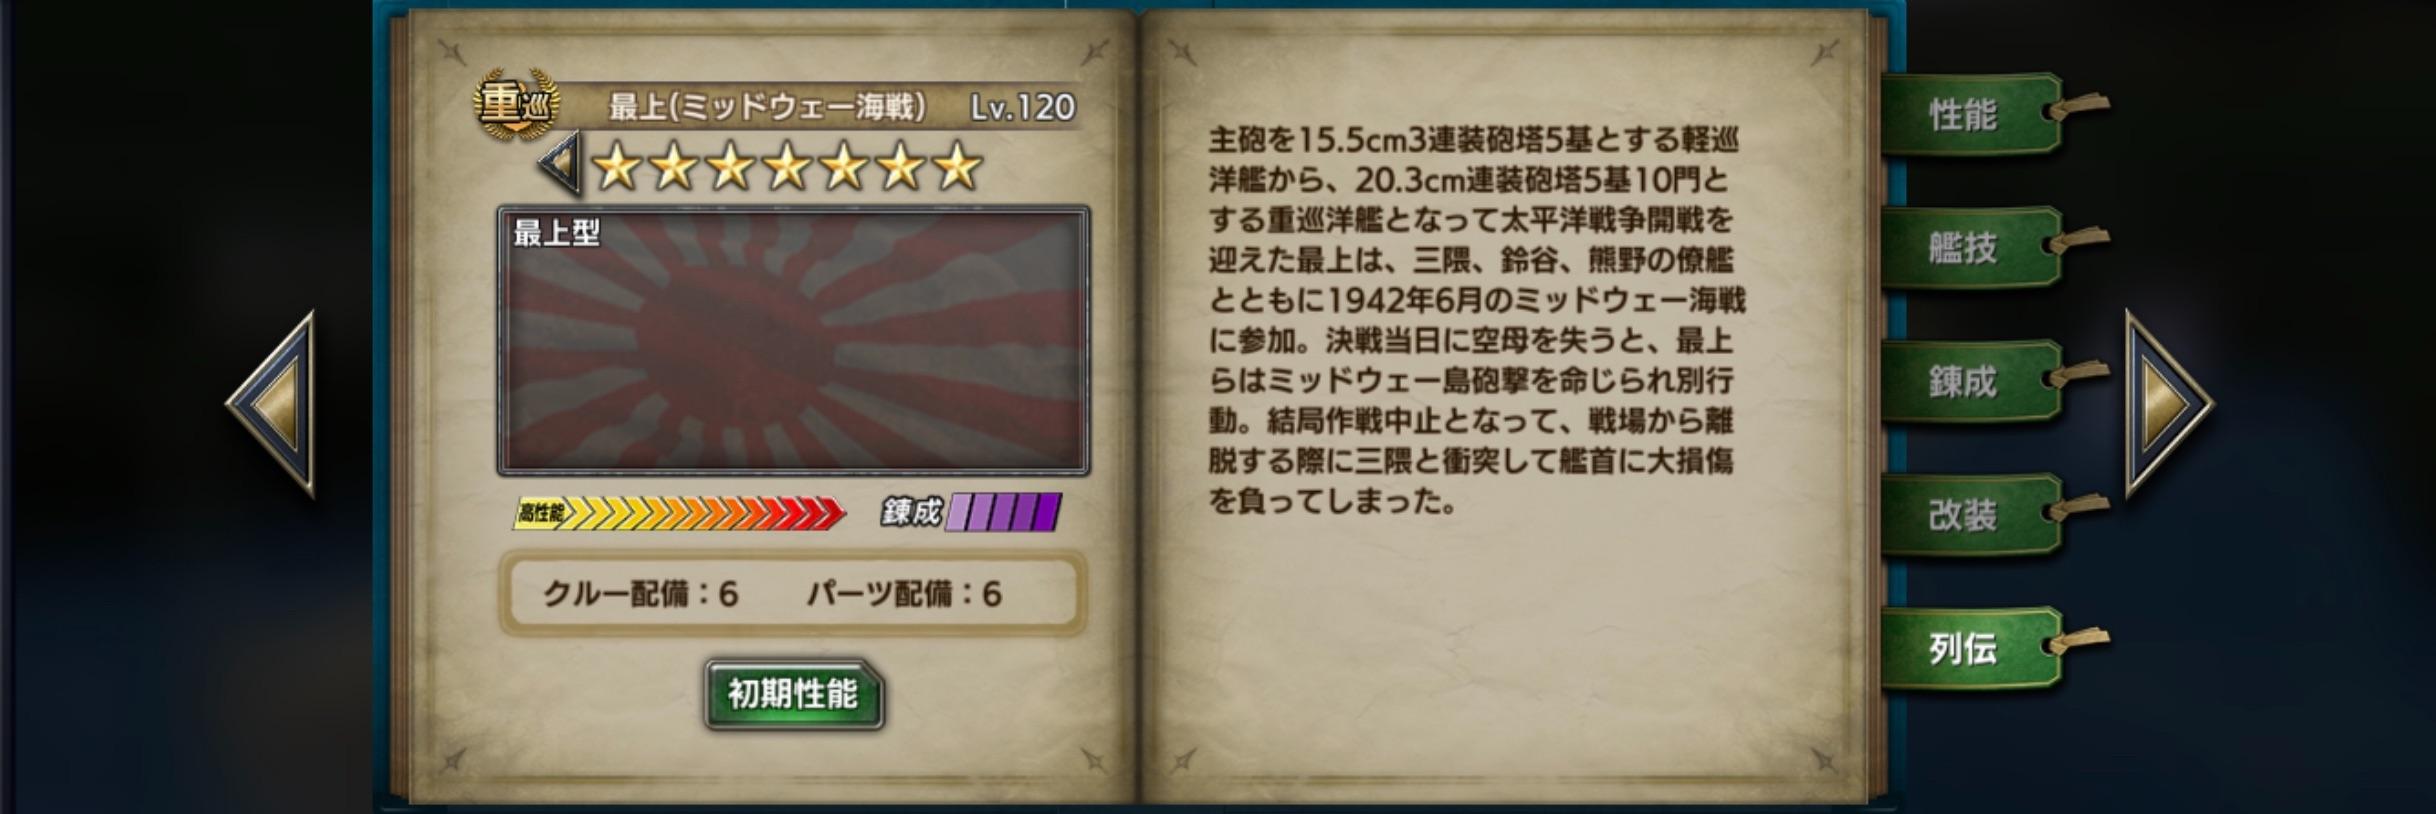 MogamiM-history